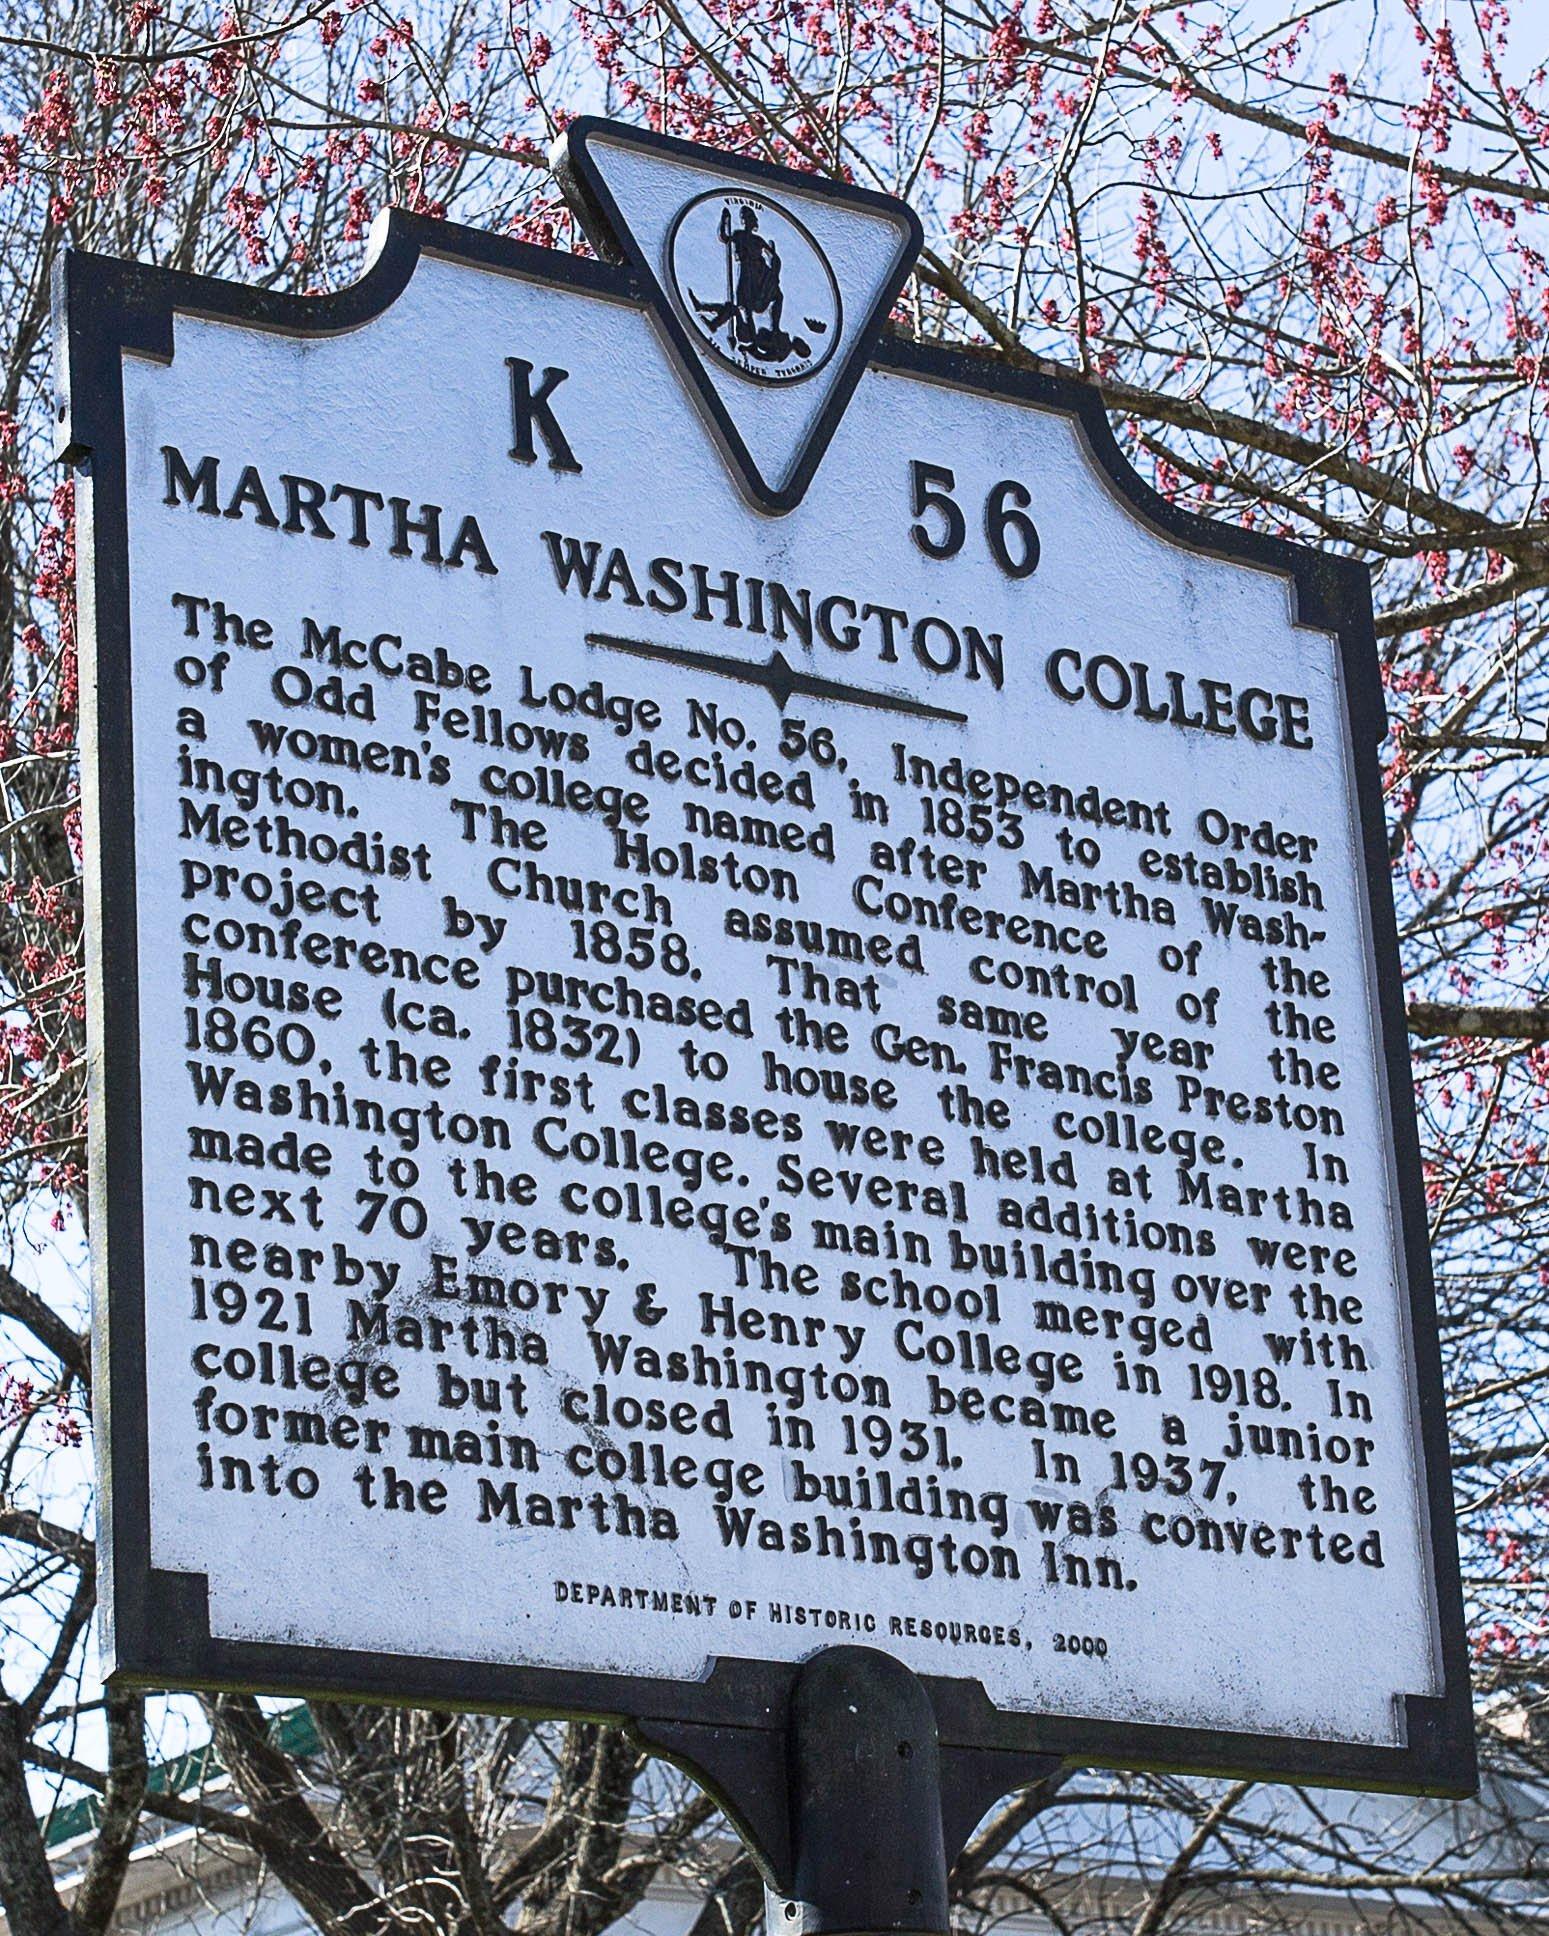 Martha Washington College historical marker